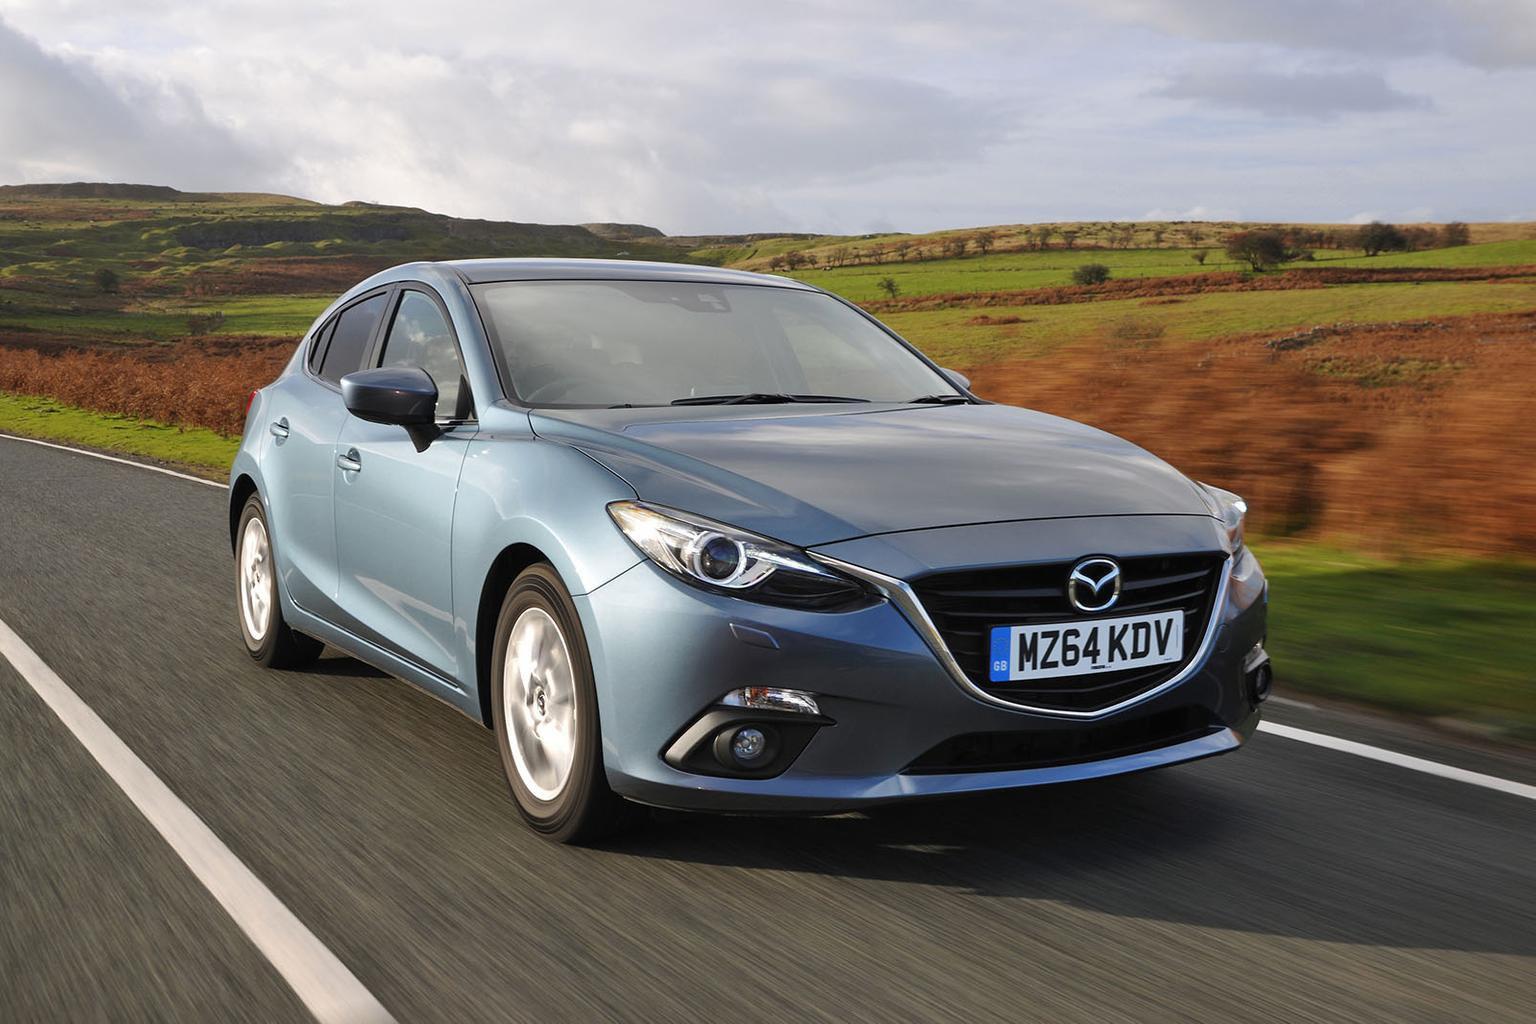 2016 Mazda 3 1.5D review